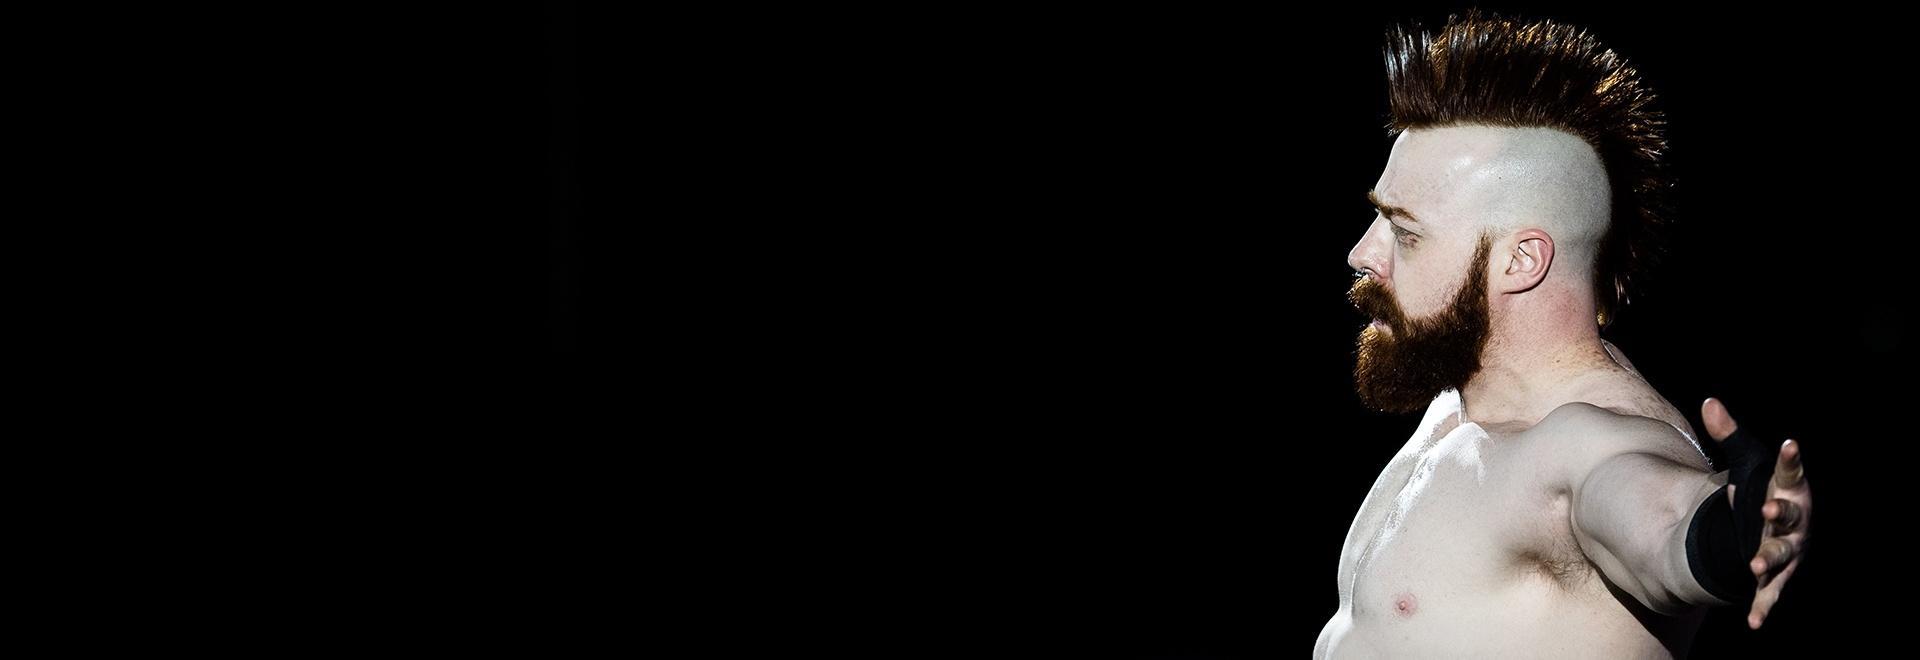 Ep. 25